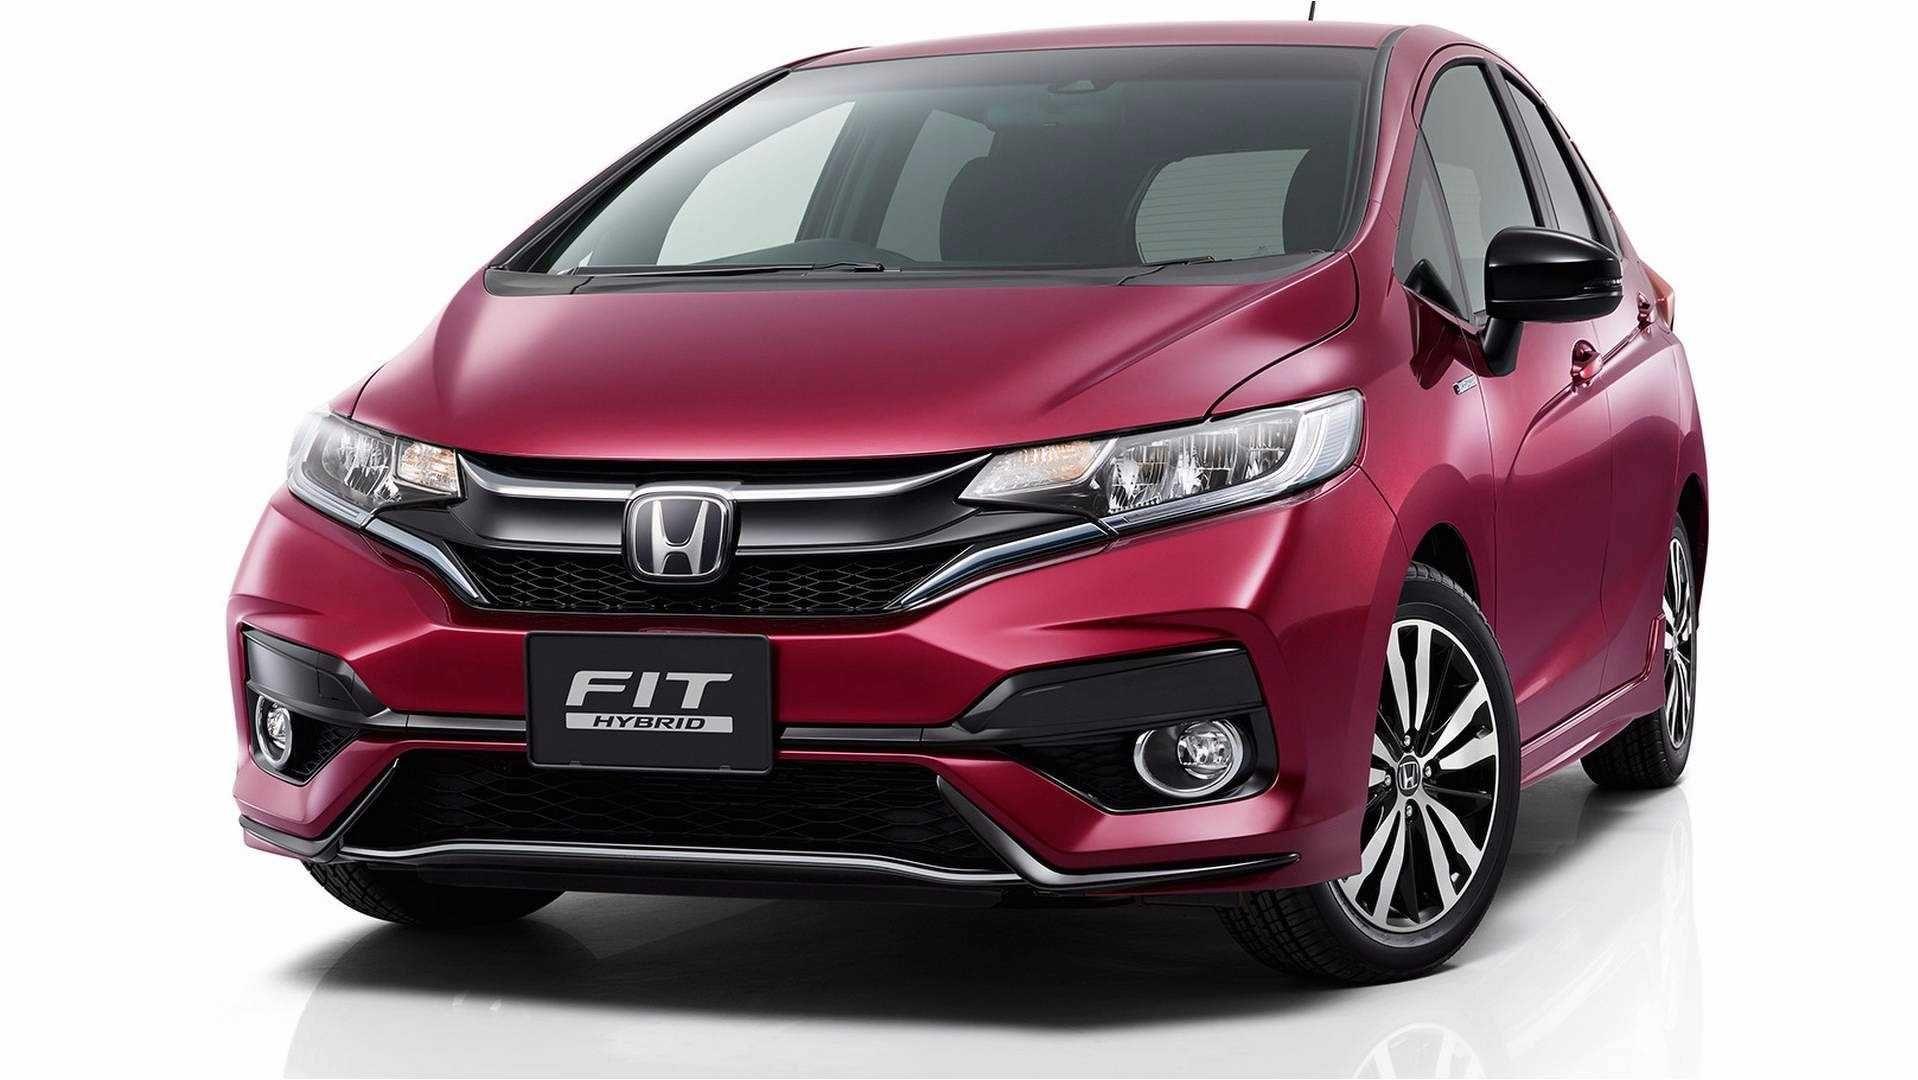 Cars Best Images Of New Model 2018 Honda Fit Hybrid Surprise